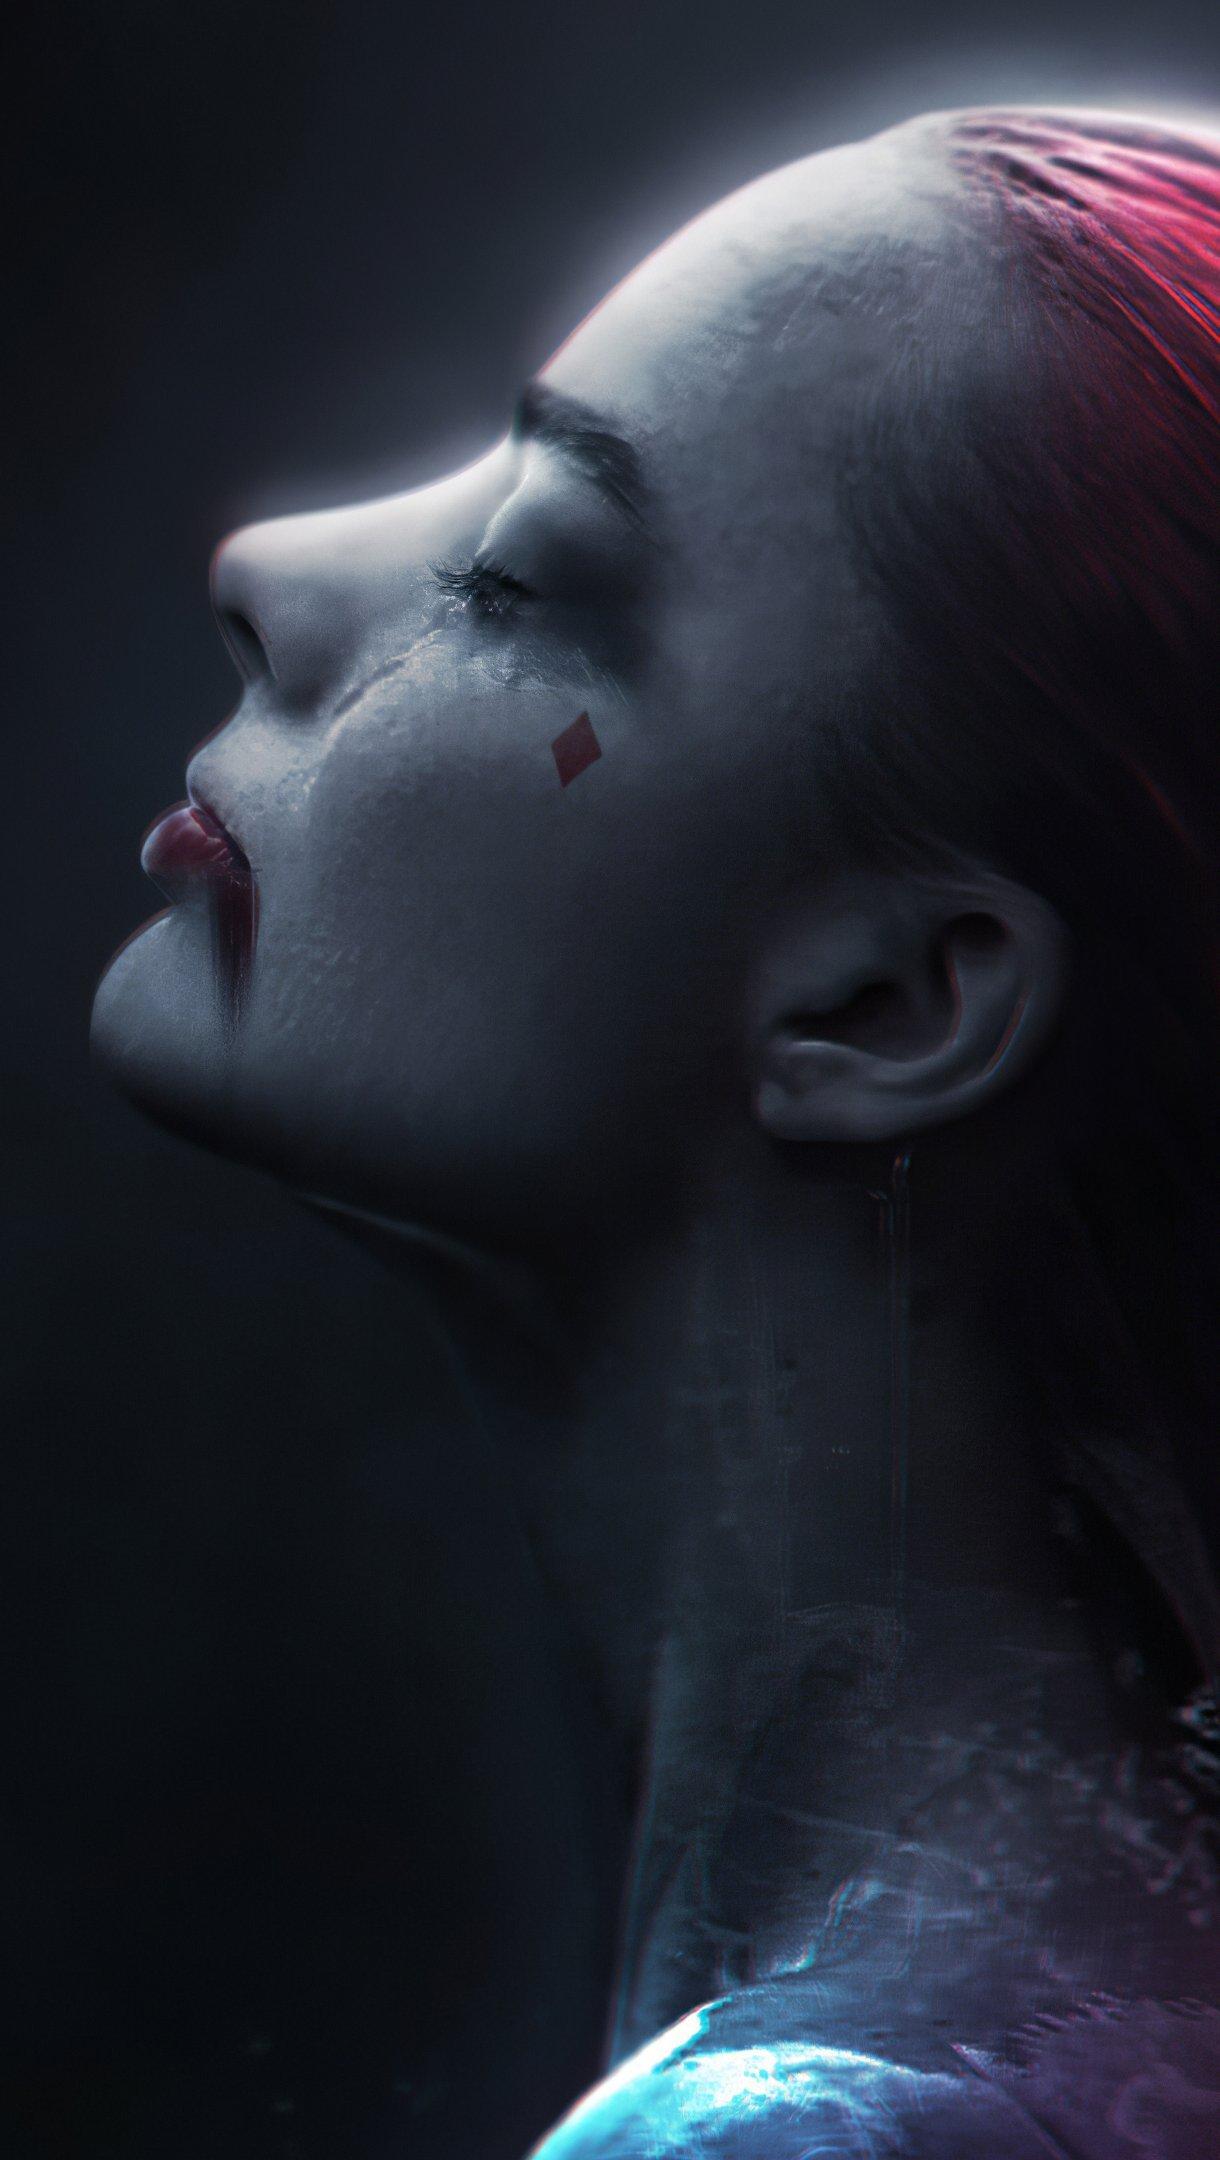 Fondos de pantalla Harley Quinn Vertical